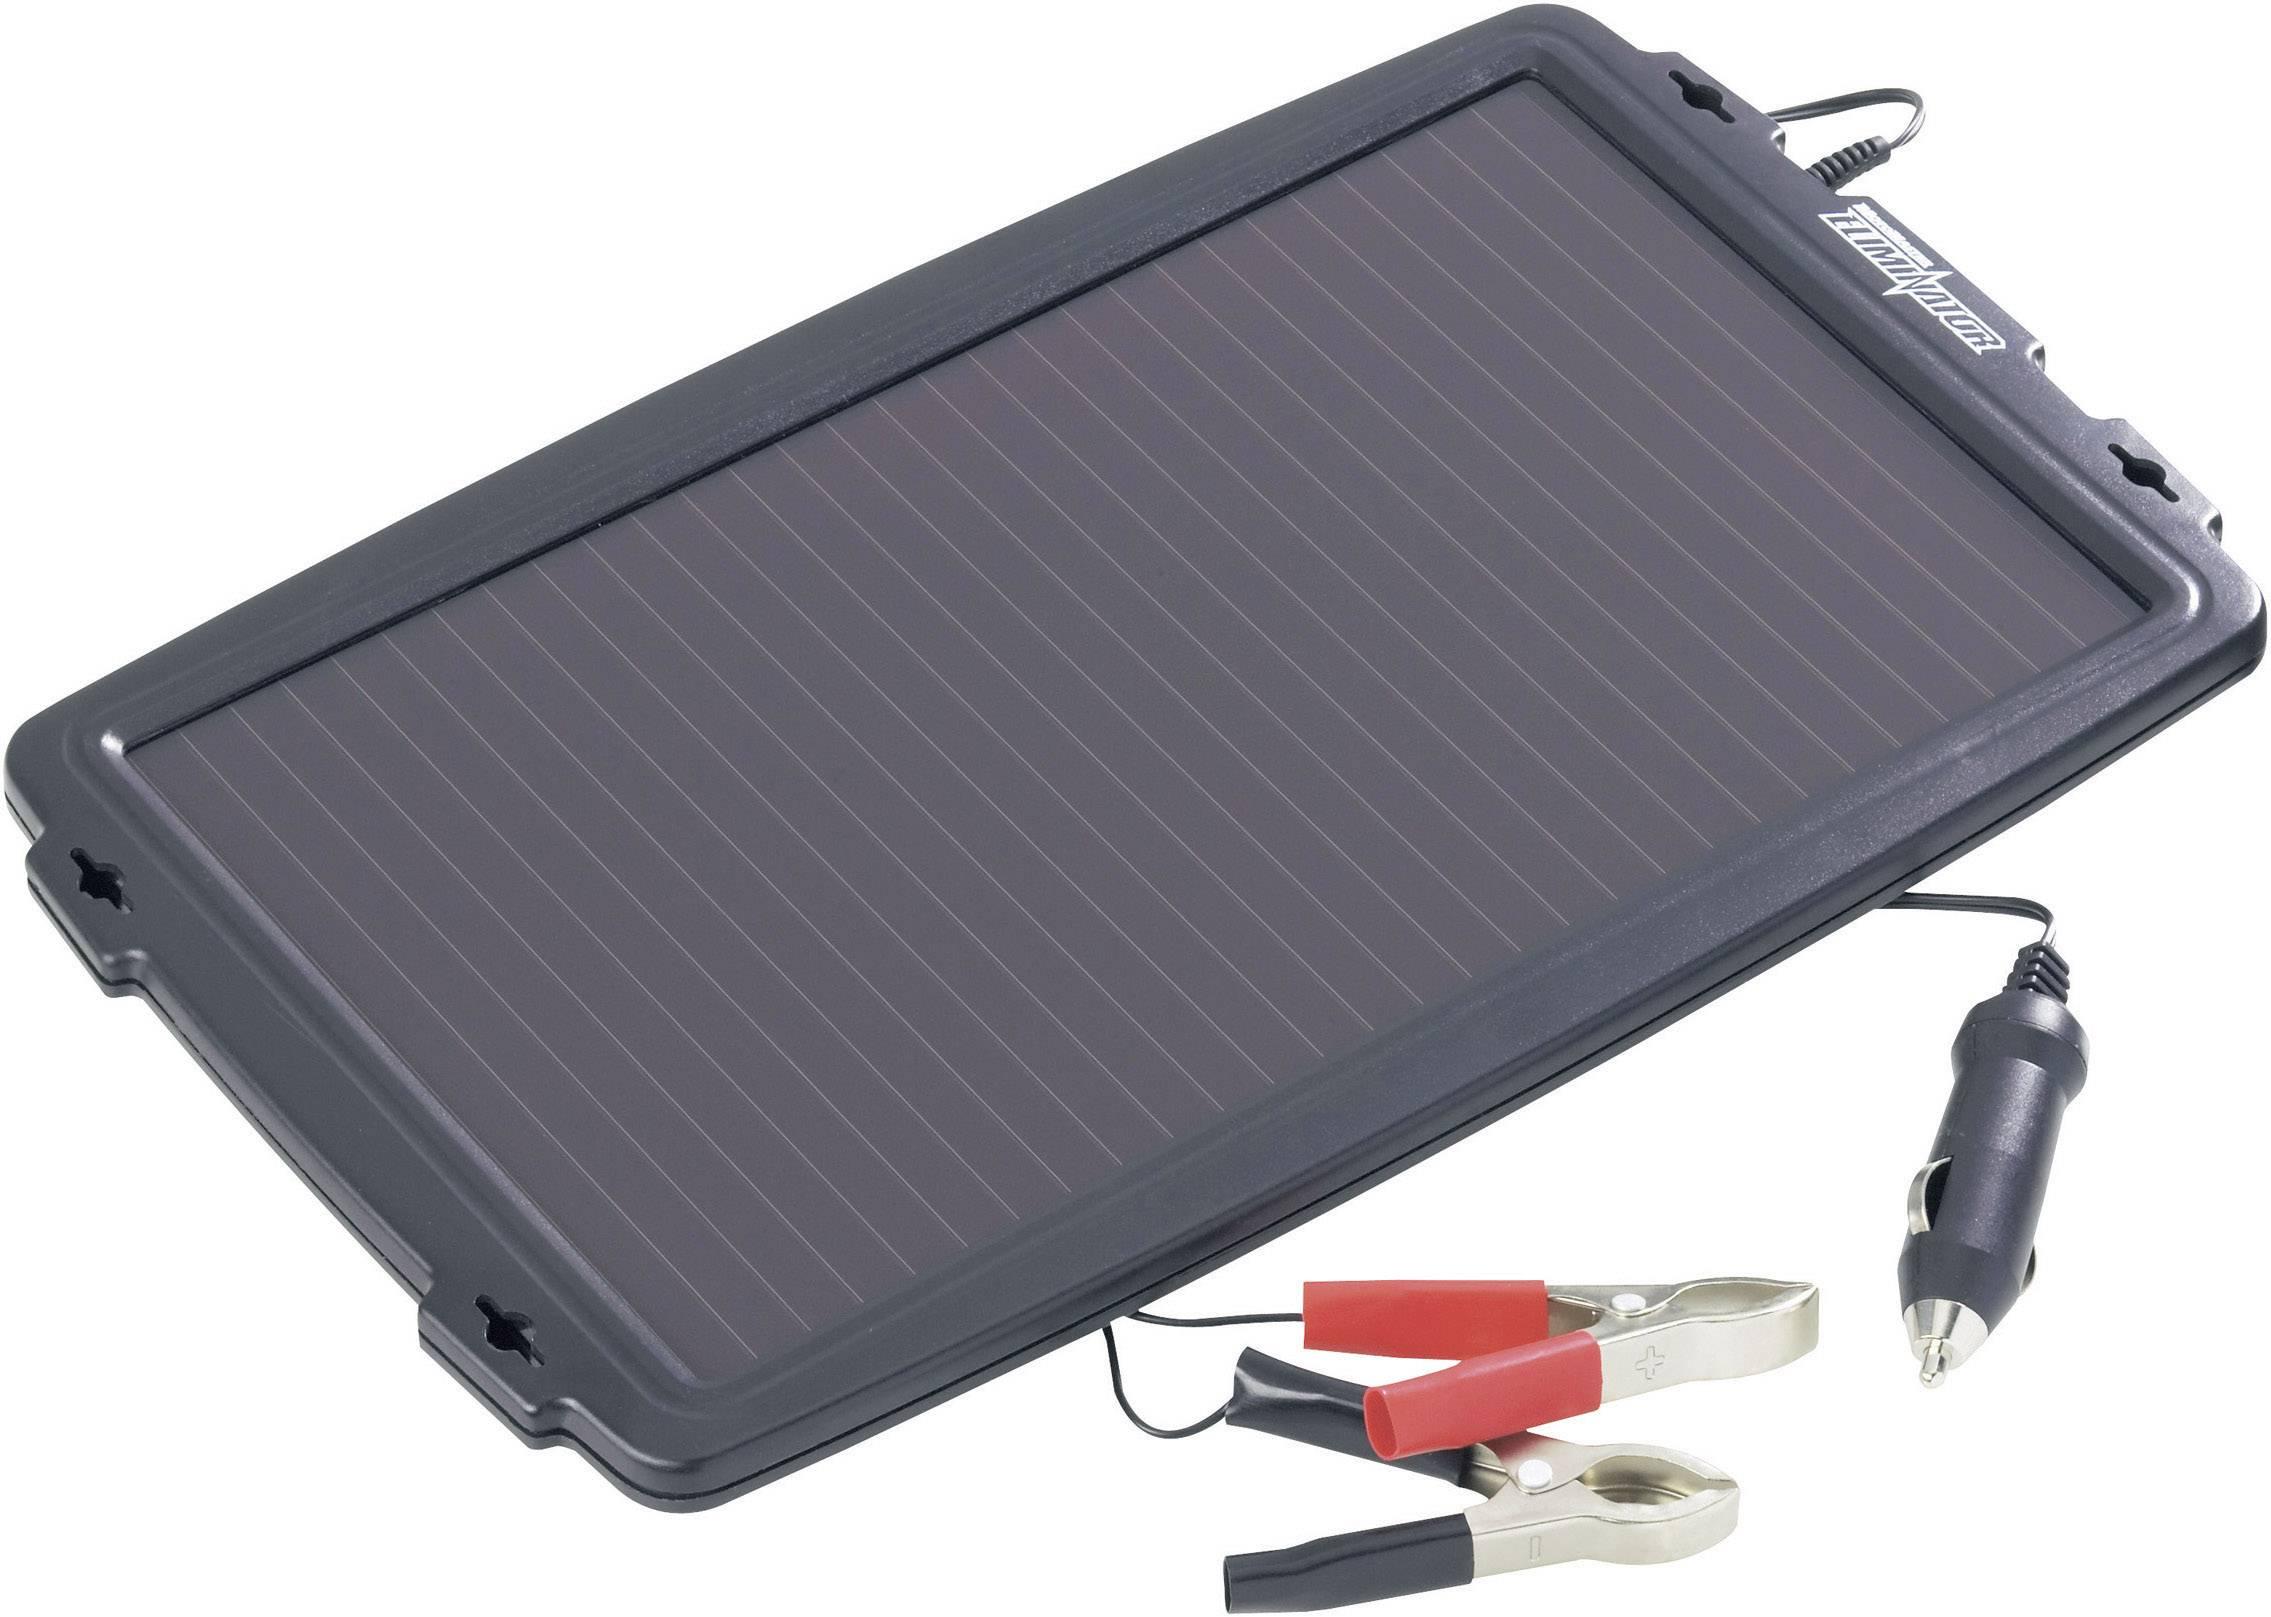 Solárna nabíjačka autobatérií, TPS-102-2.4, 2,4 W